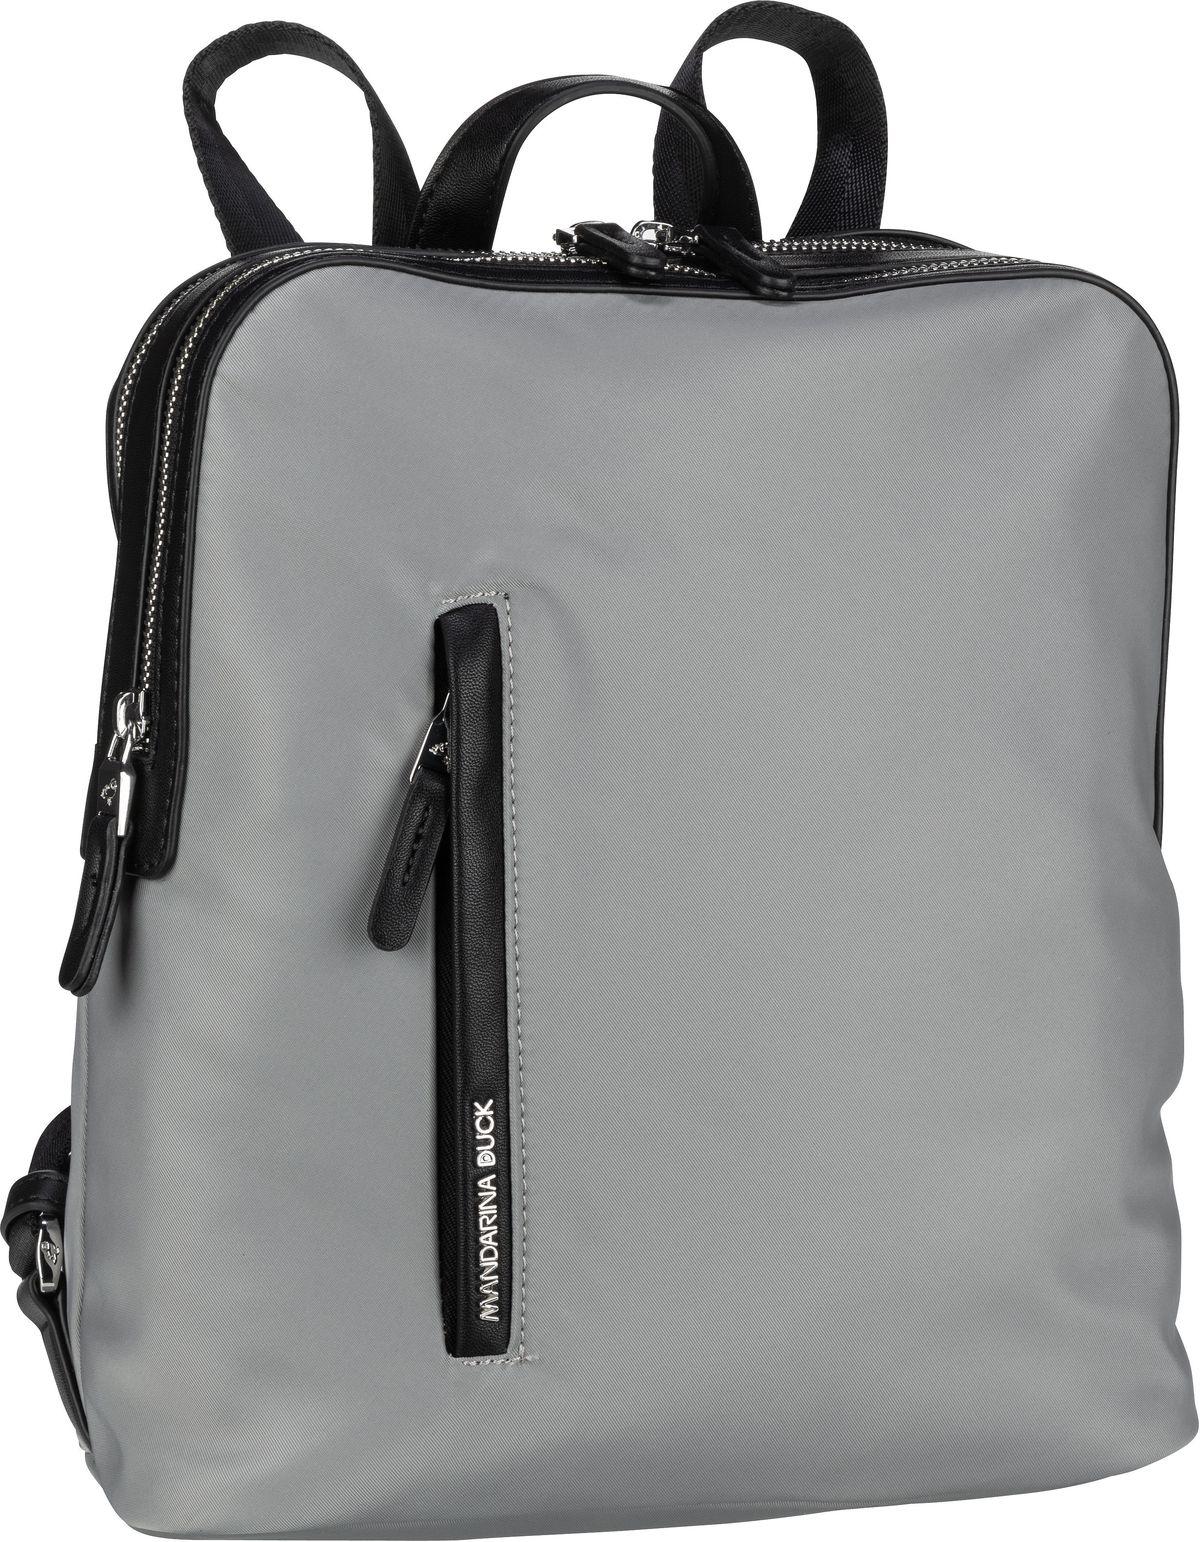 Rucksack / Daypack Hunter Small Backpack VCT08 Aluminium